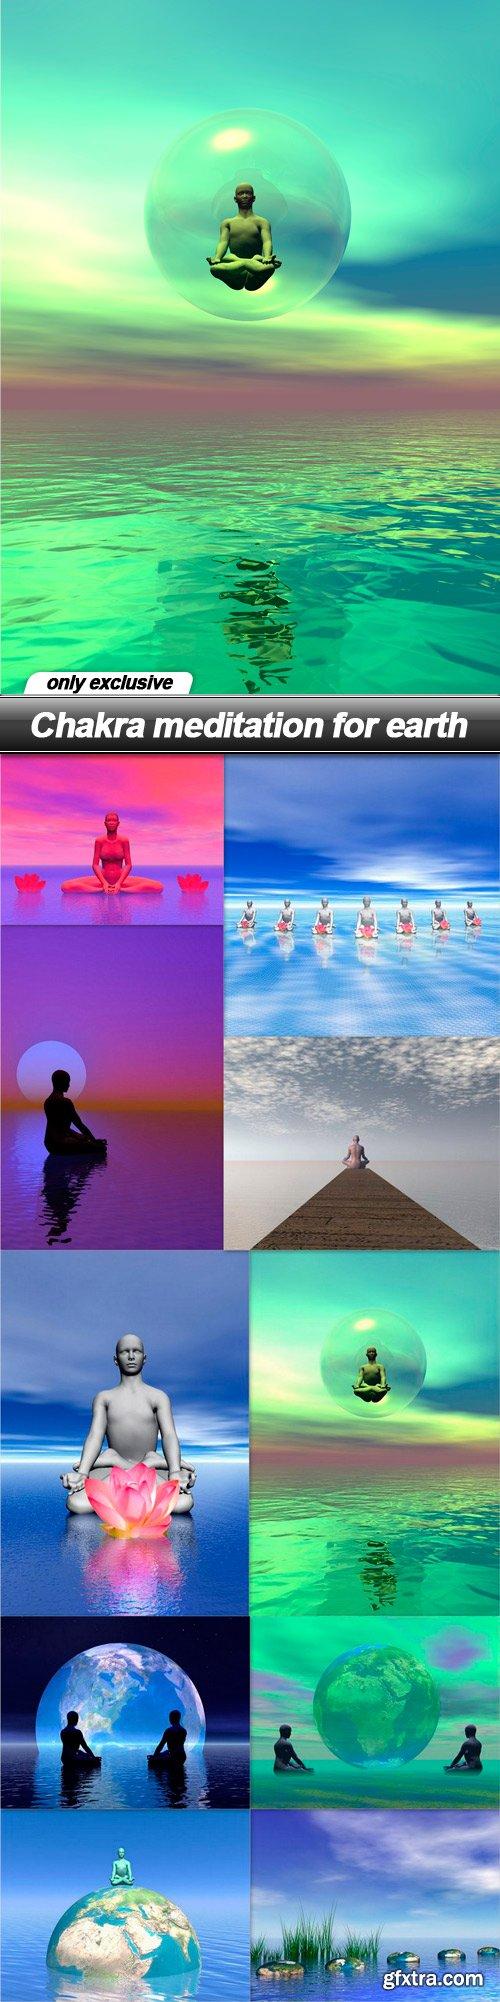 Chakra meditation for earth - 10 UHQ JPEG